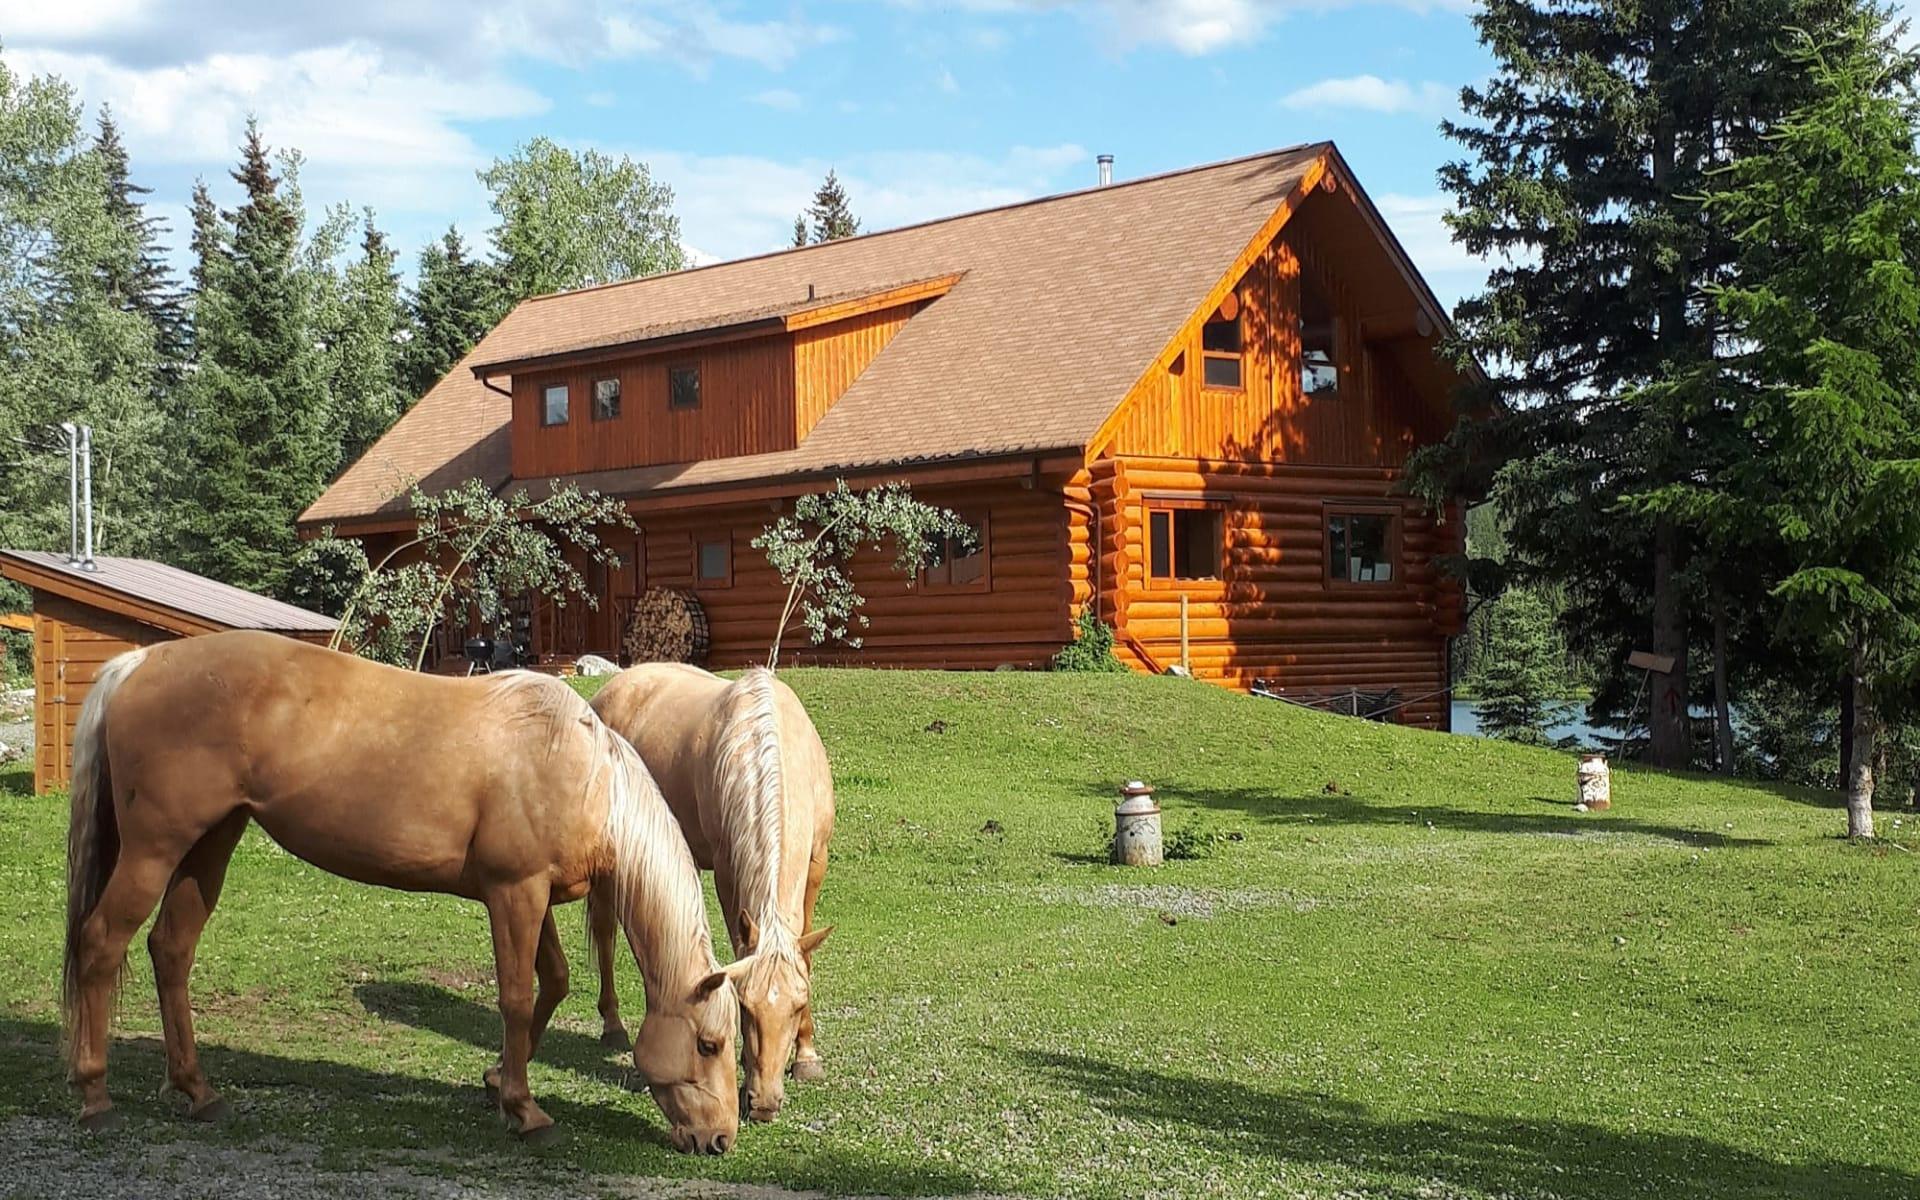 Wettstone Guest Ranch in Bridge Lake: Exterior_Wettstone Guest Ranch_Aussenansicht_CSM